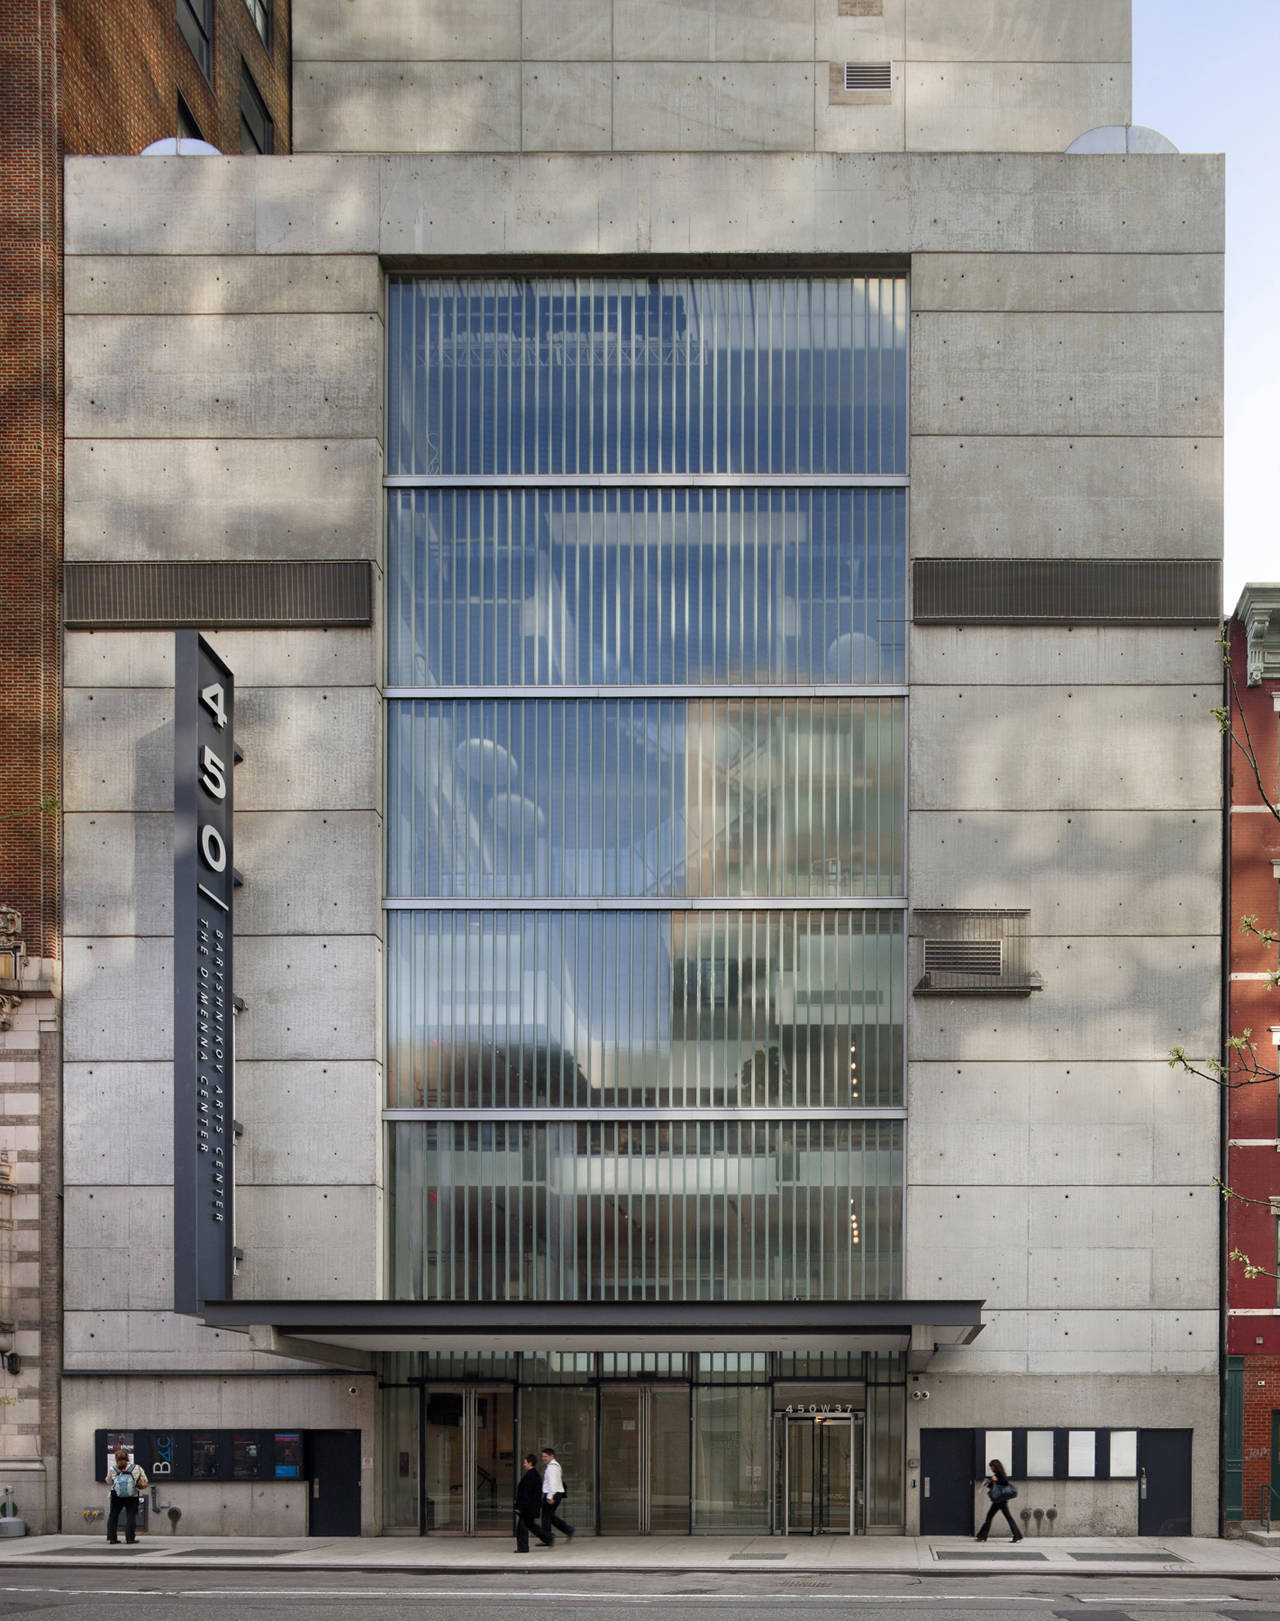 Orchestra Of St. Lukes / H3 Hardy Collaboration Architecture, © Francis Dzikowski – ESTO